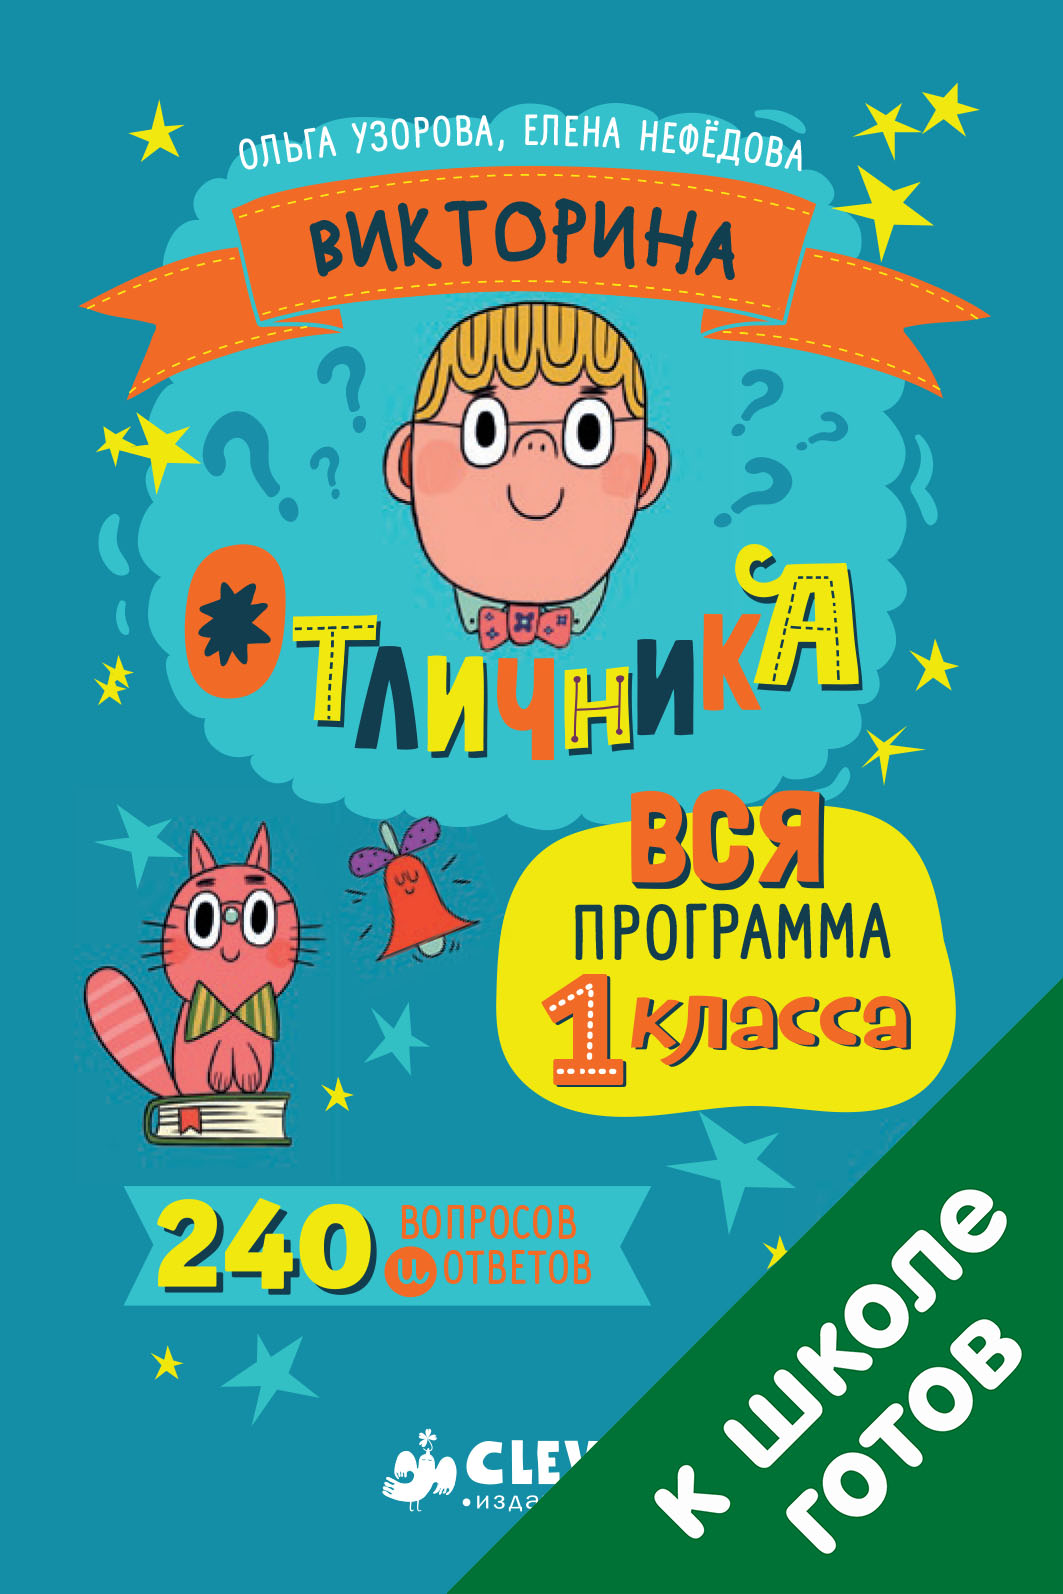 Zakazat.ru: Викторина отличника. Вся программа 1 класса. 240 вопросов и ответов. О. В. Узорова, Е. А. Нефедова